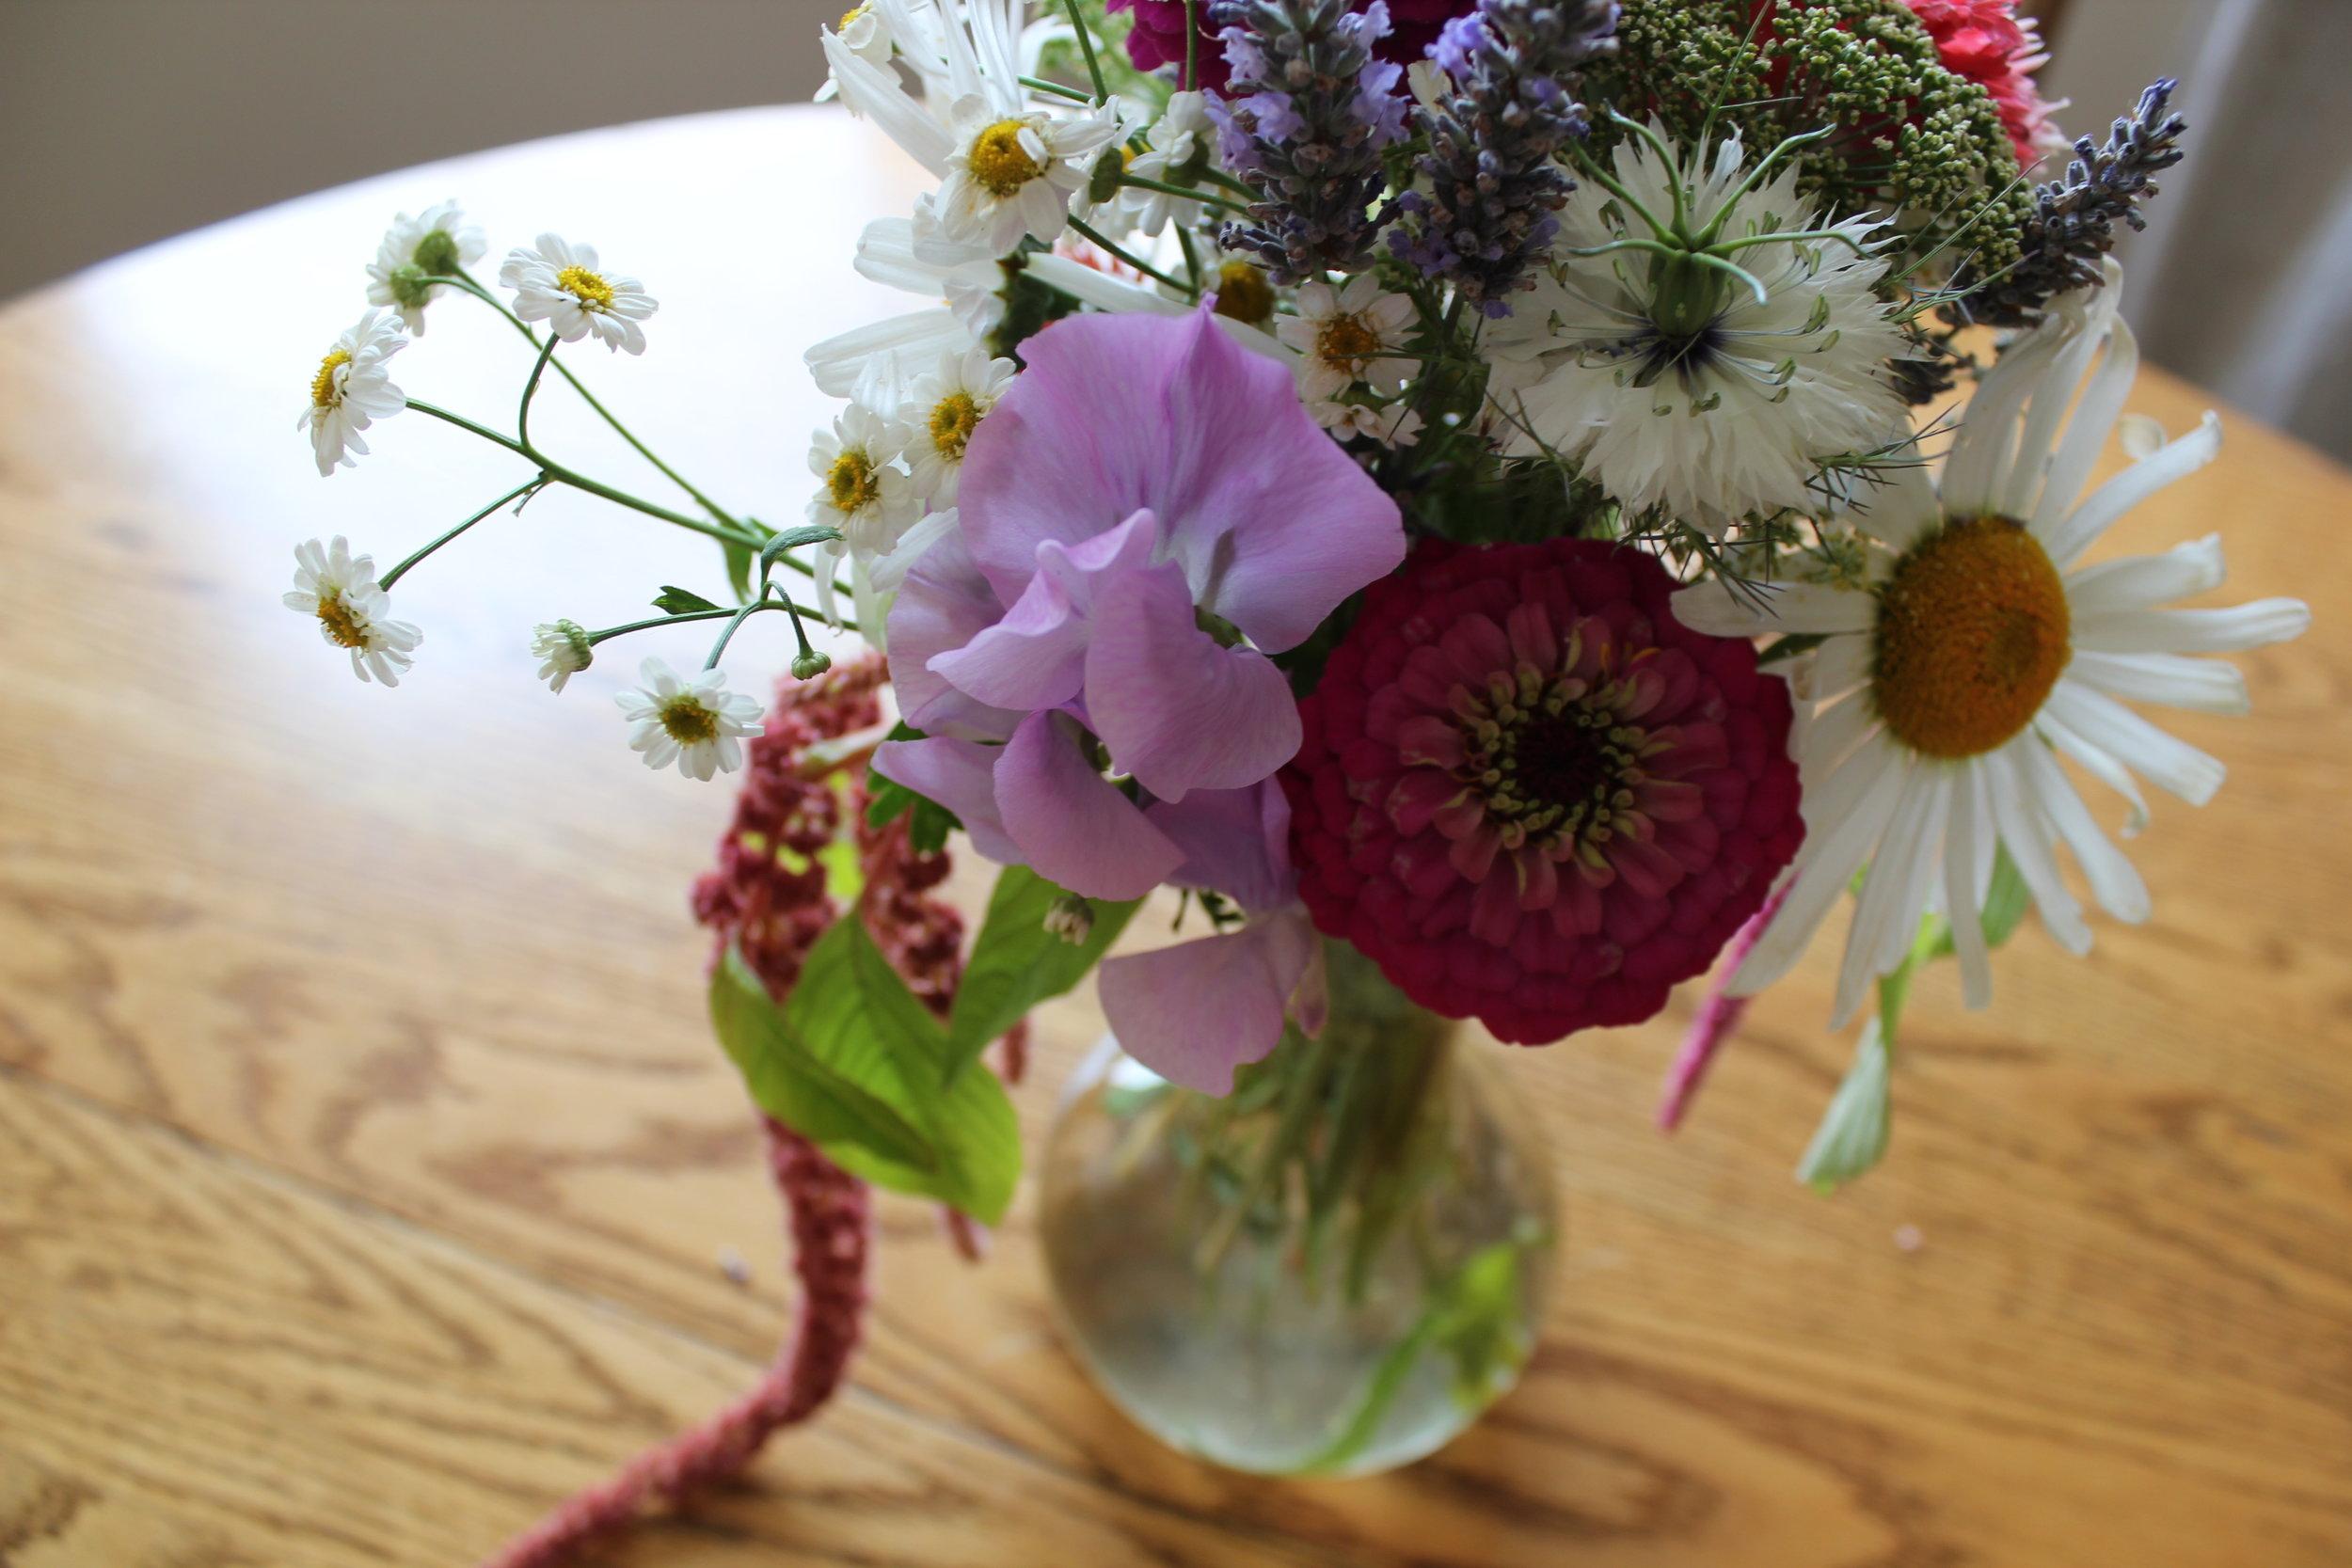 fresh flowers for plum nelli apartment rental.JPG